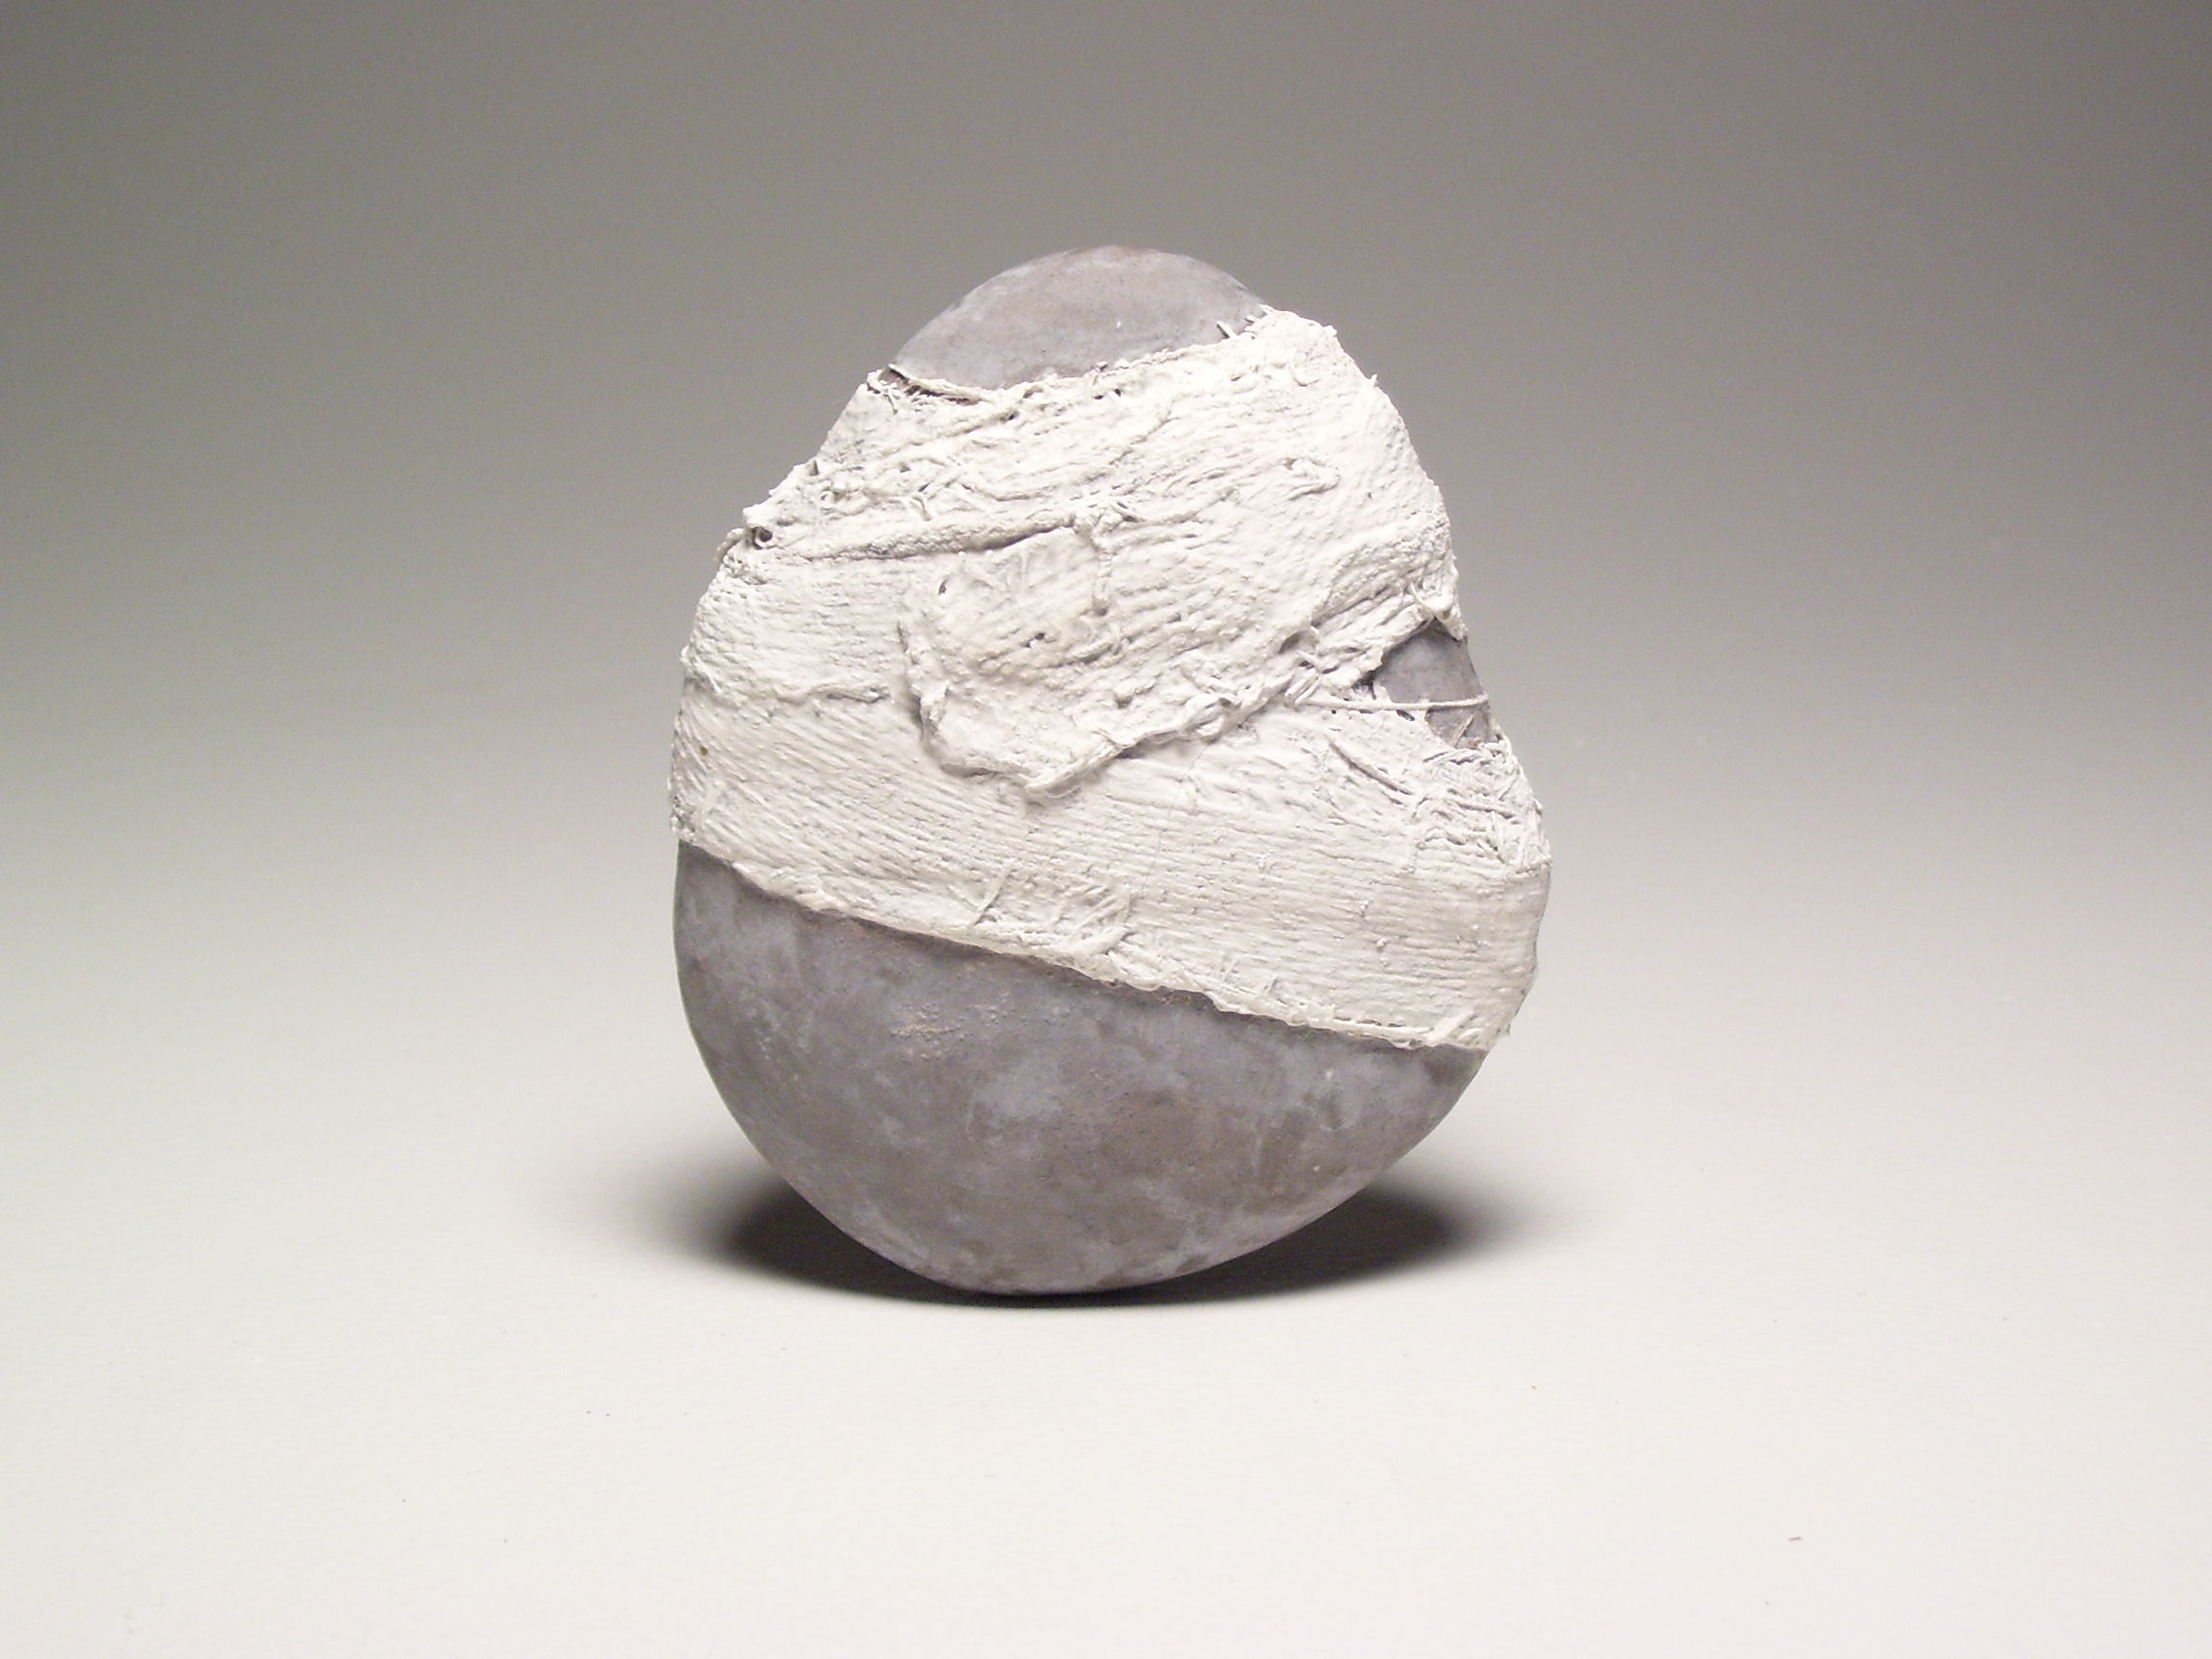 Injured a Stone